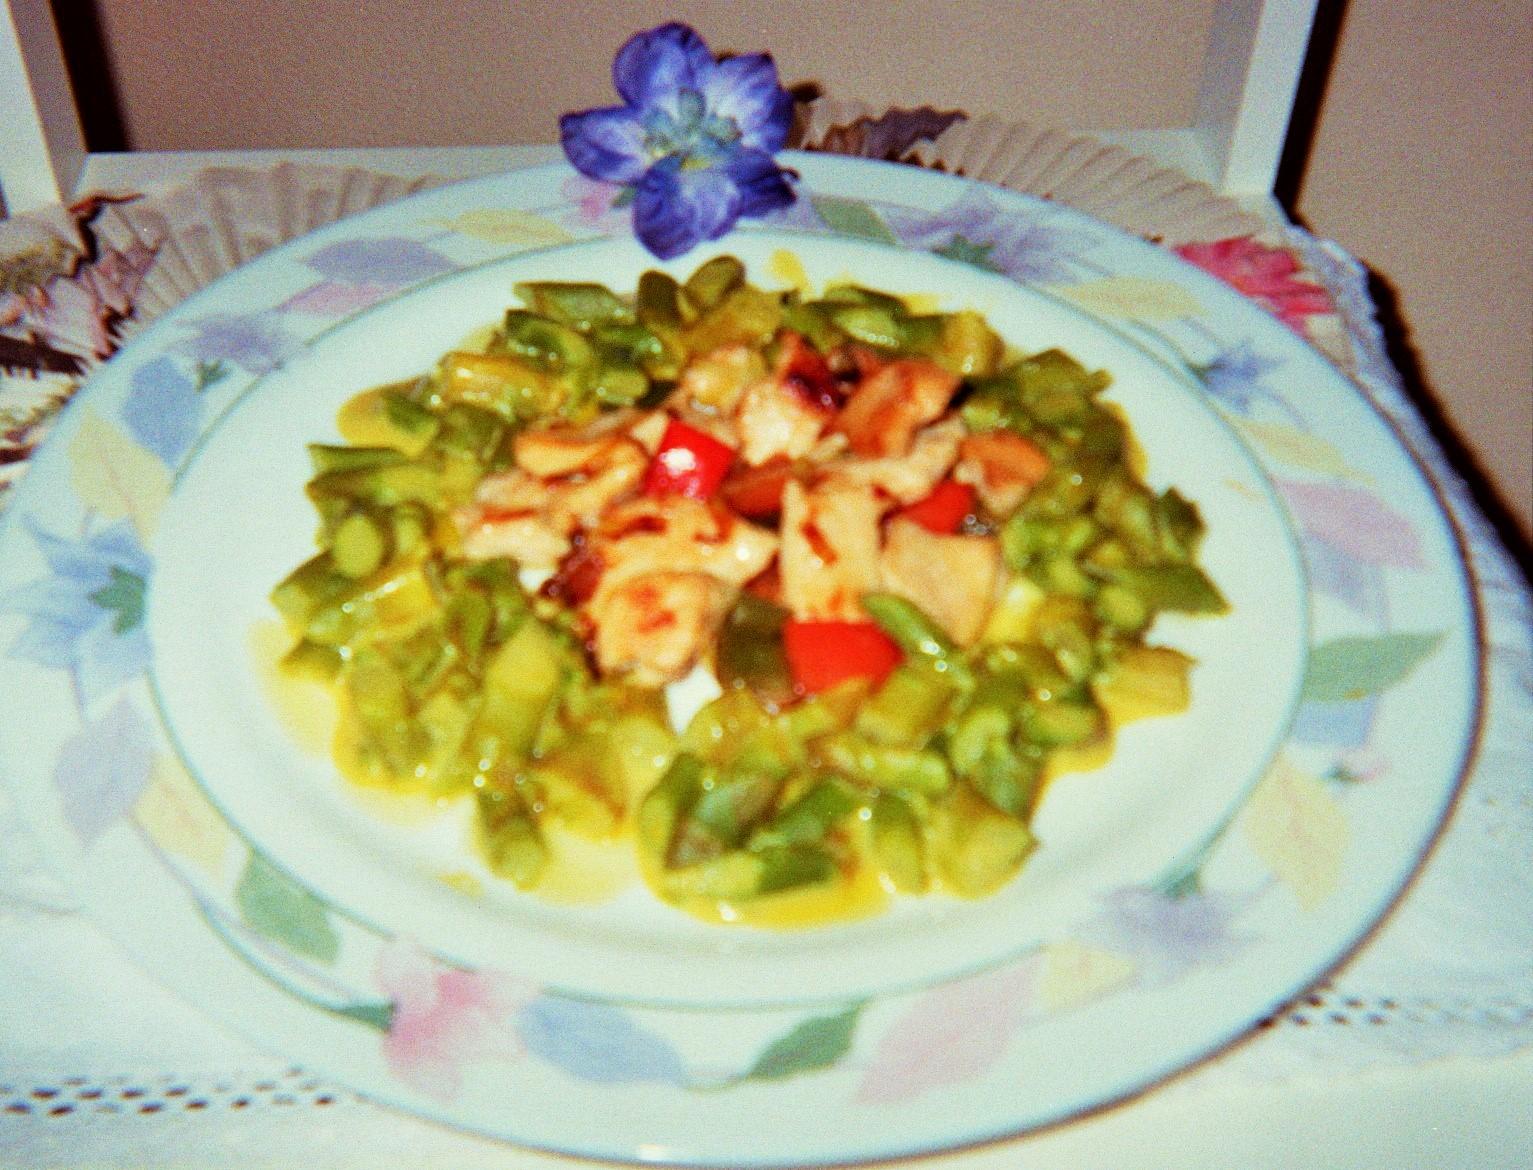 LE RICETTE DI CASA MIA CENTONOVANTAQUATTRESIMA PARTE #753D14 1533 1170 Ricette Cucina Disegnate